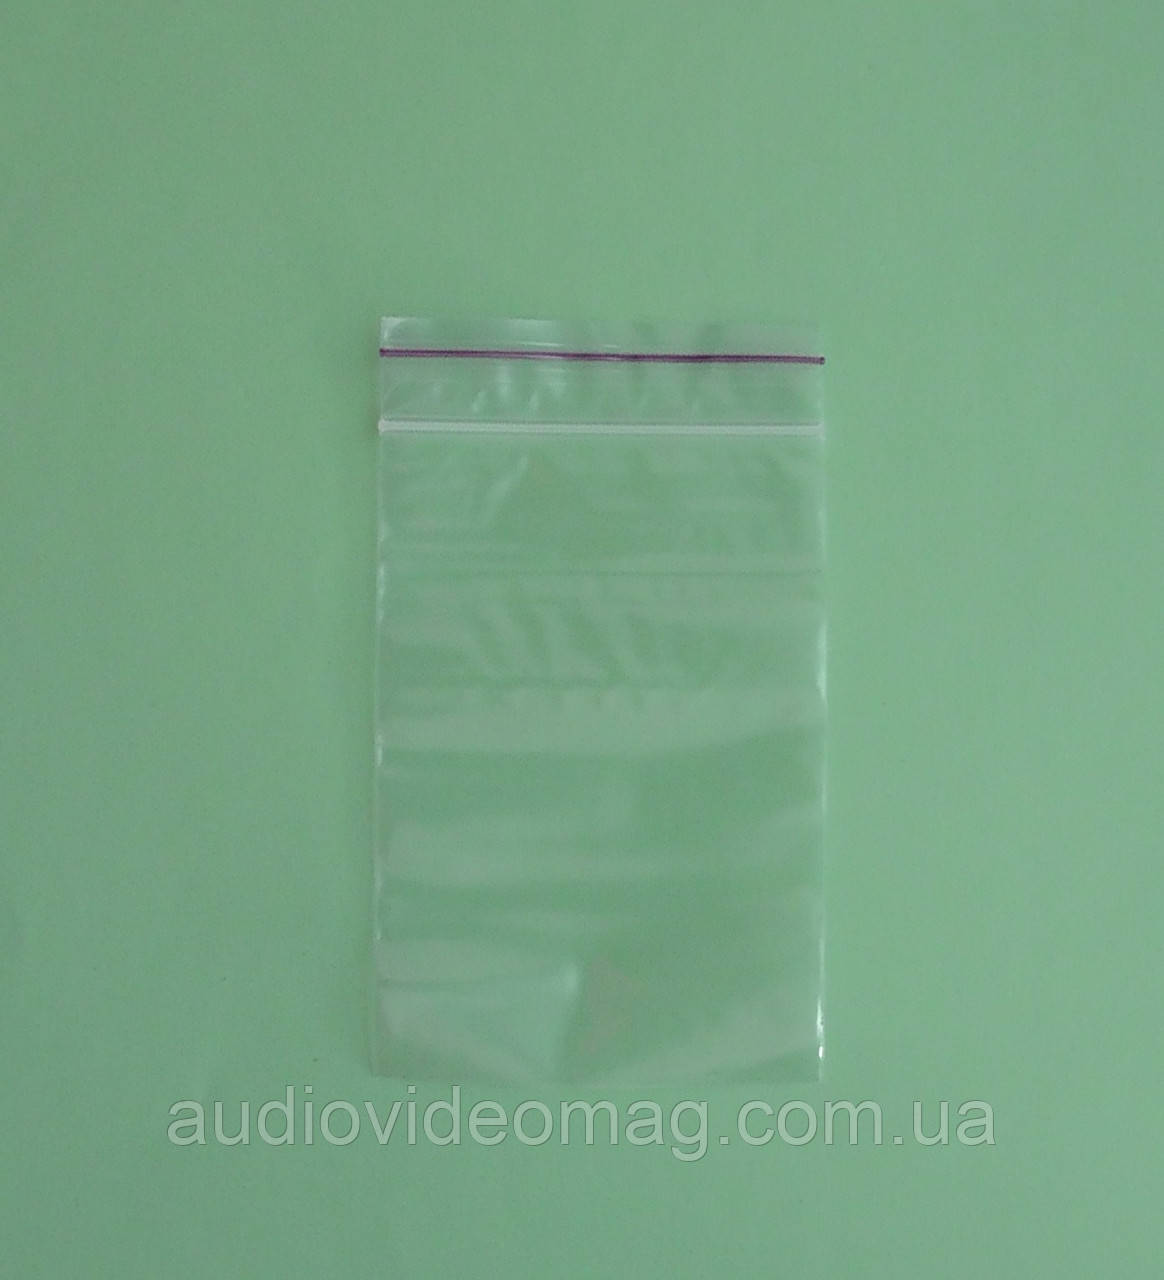 Зип-пакет со струнным замком Zip-lock, размер 7 х 10 см., упаковка 100 шт.